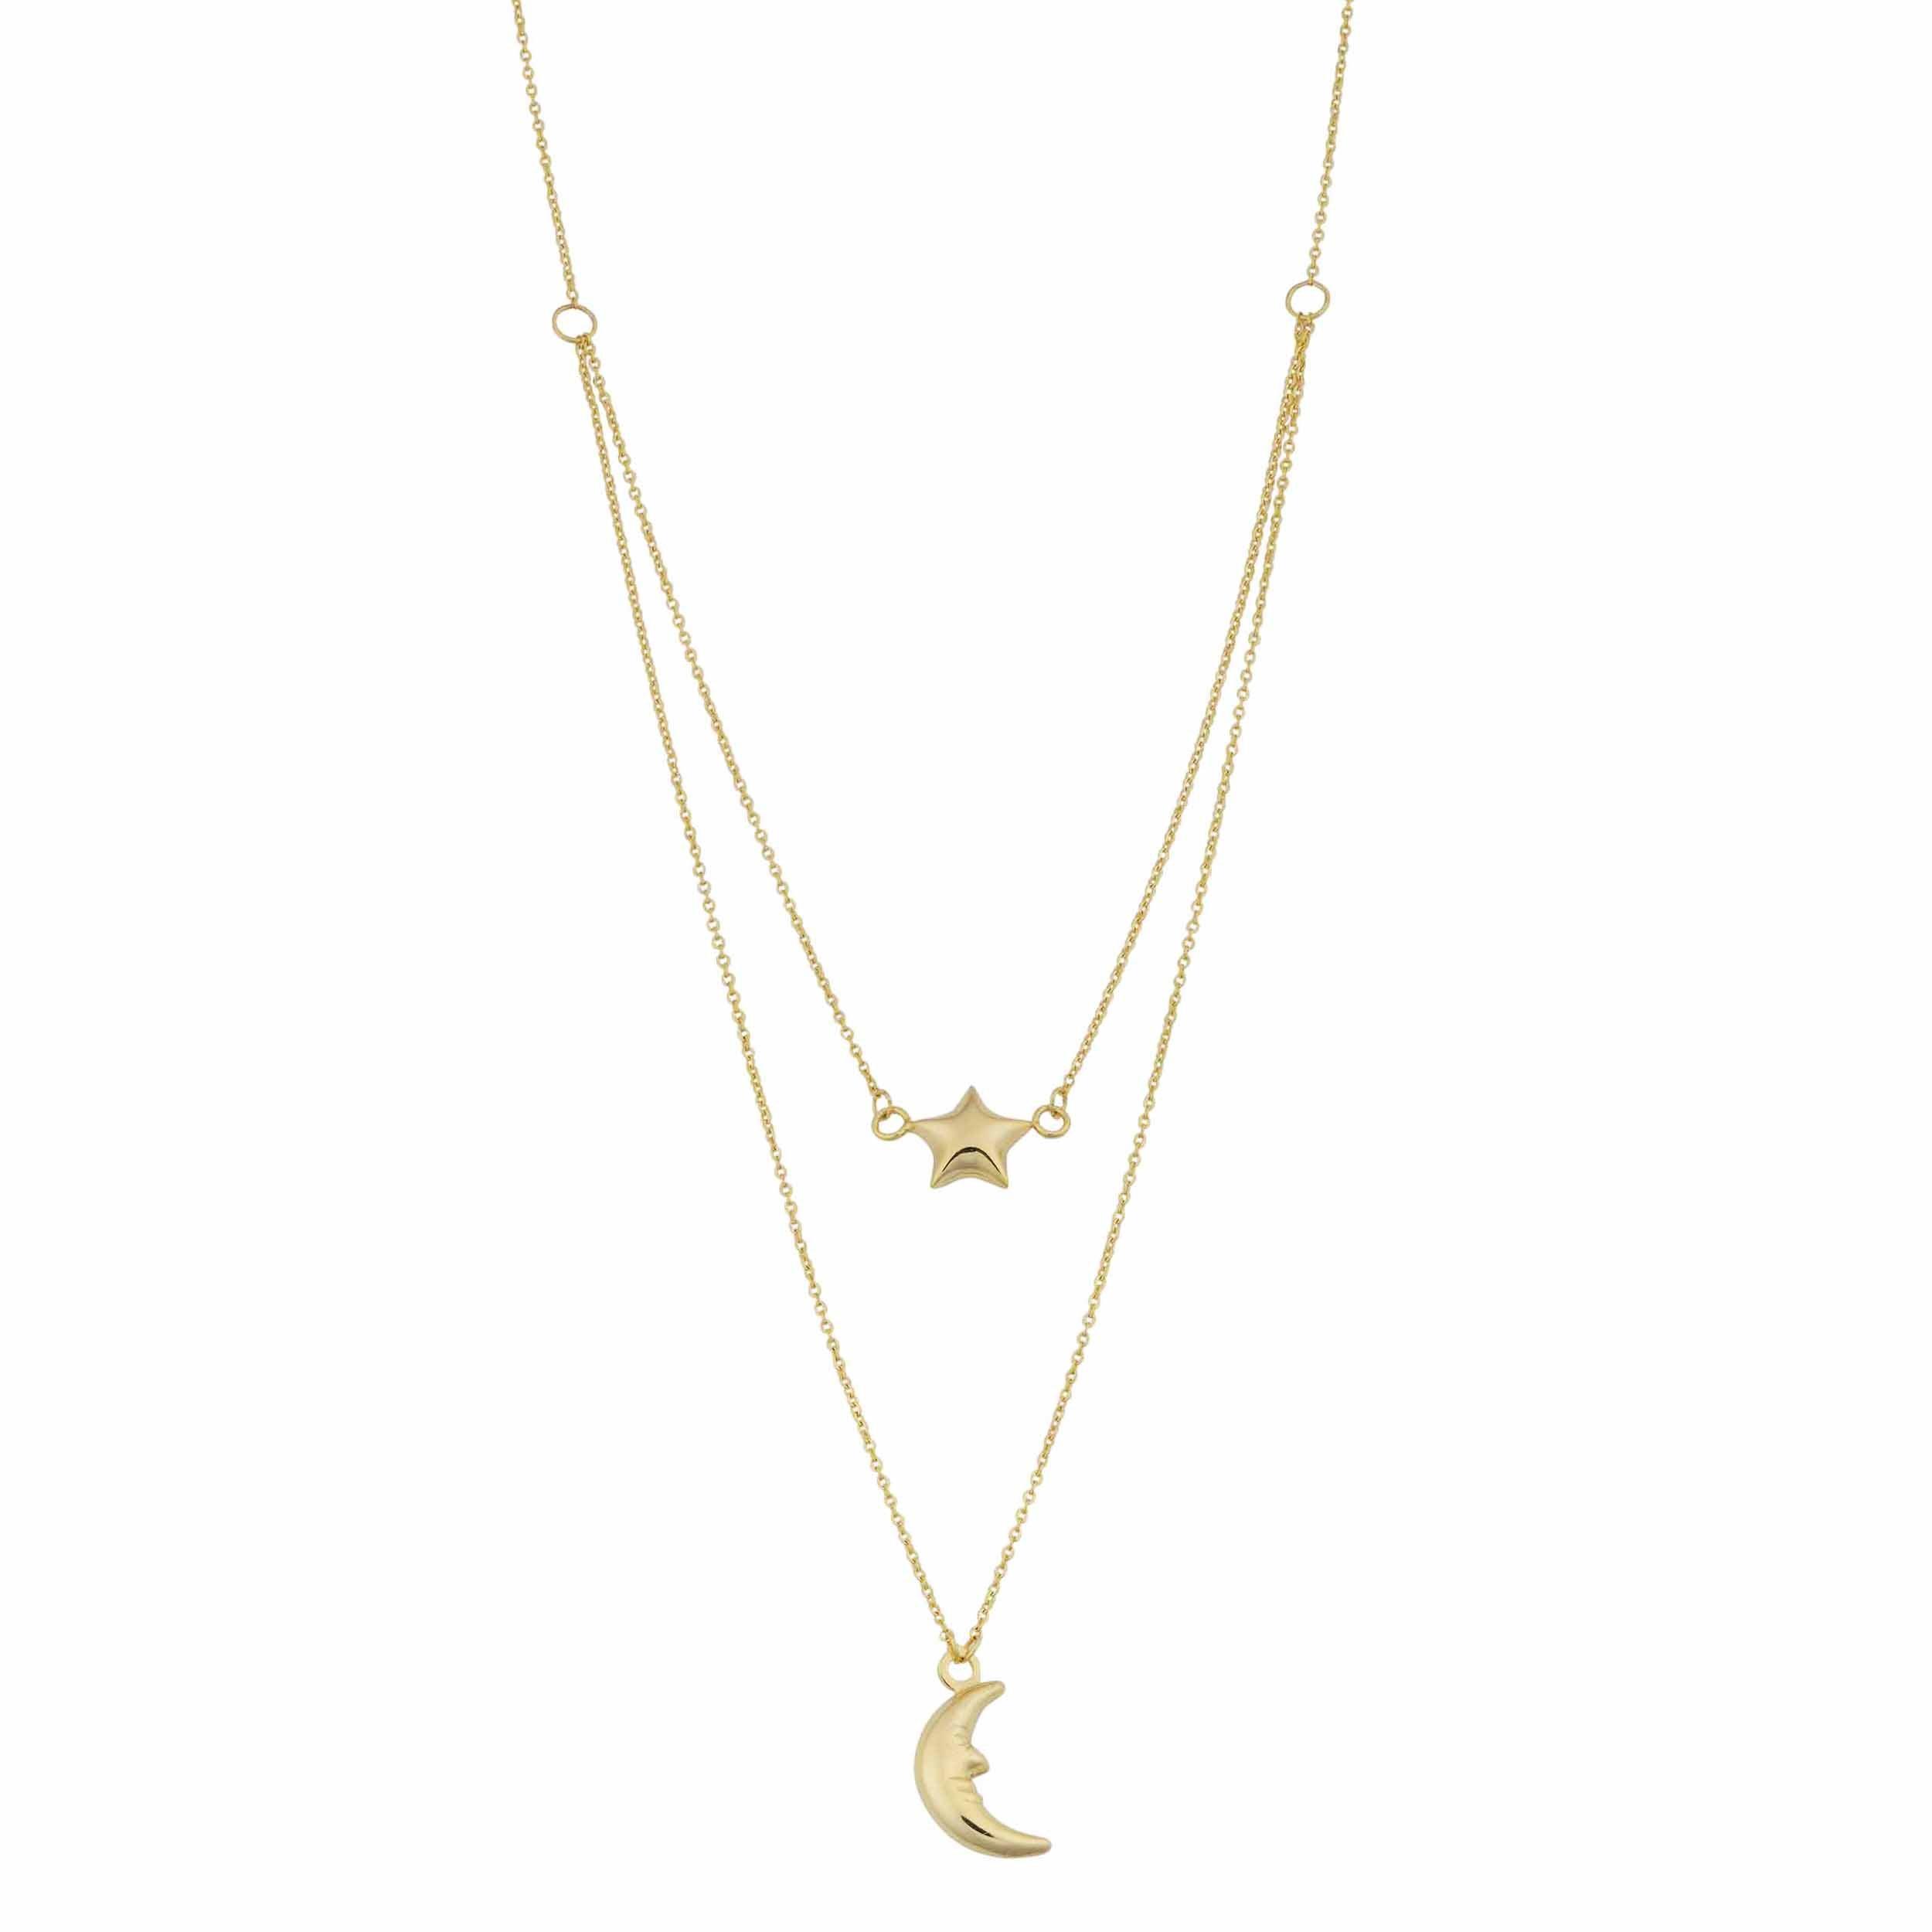 Kooljewelry 10k Yellow Gold Moon and Star Layered Necklace (17 inch) by Kooljewelry